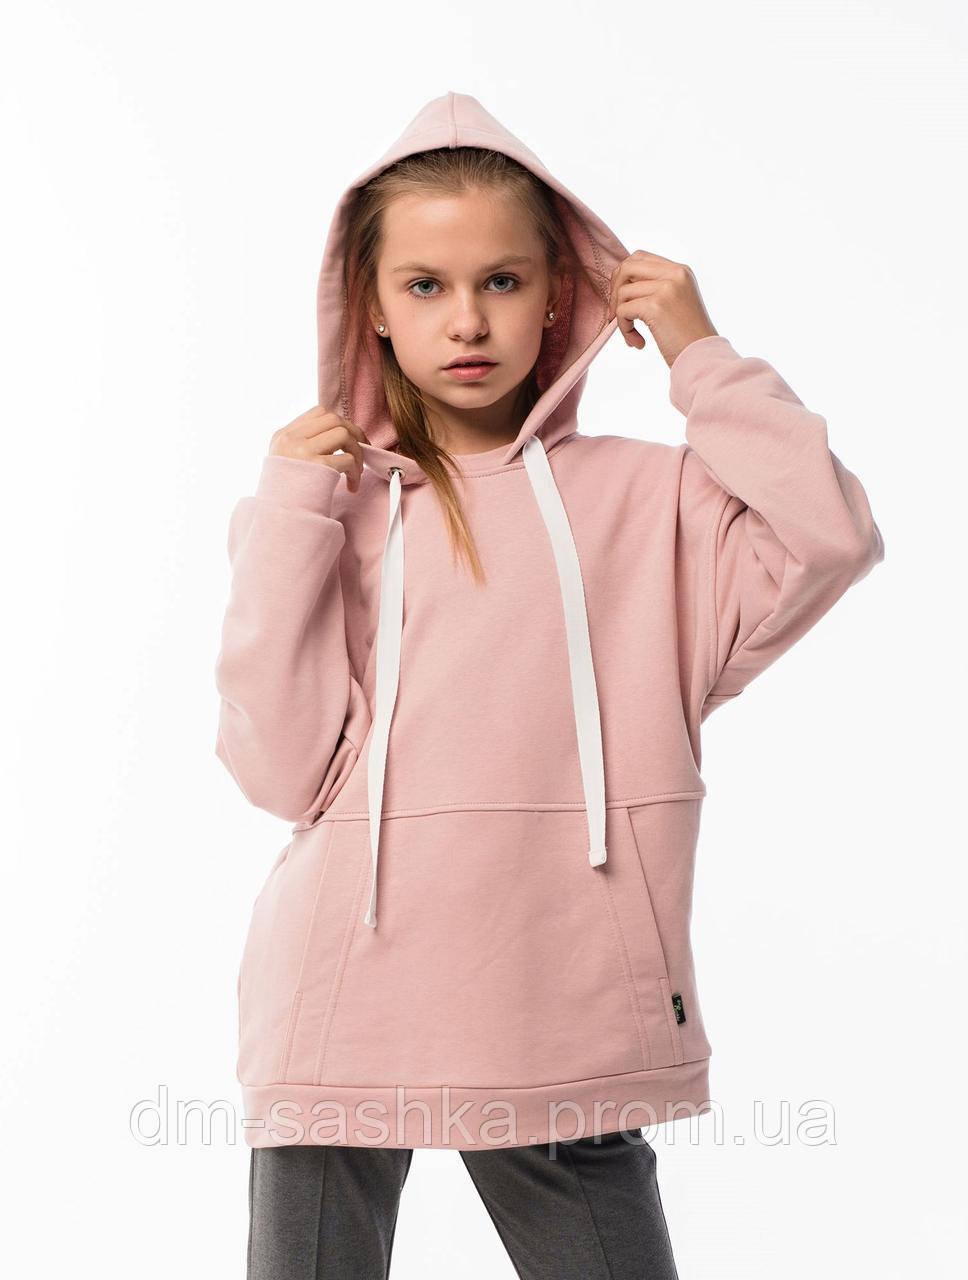 Худи для девочки OVERSIZE розовое 146р.